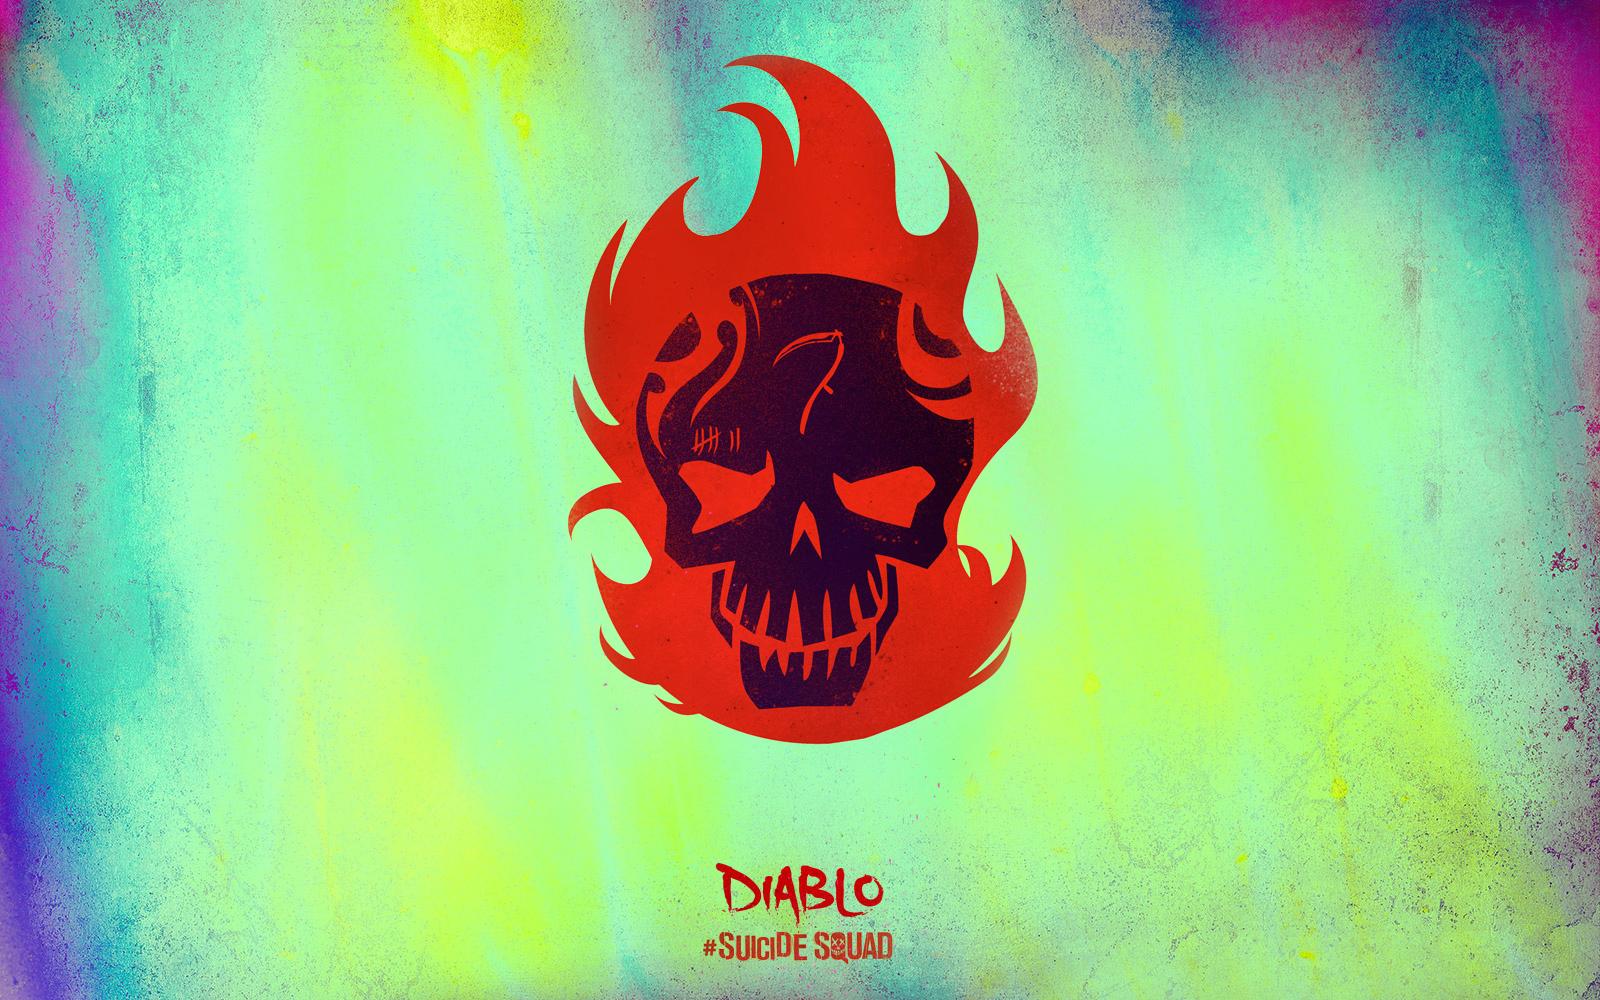 El Diablo HD Wallpapers | Backgrounds - Wallpaper Abyss